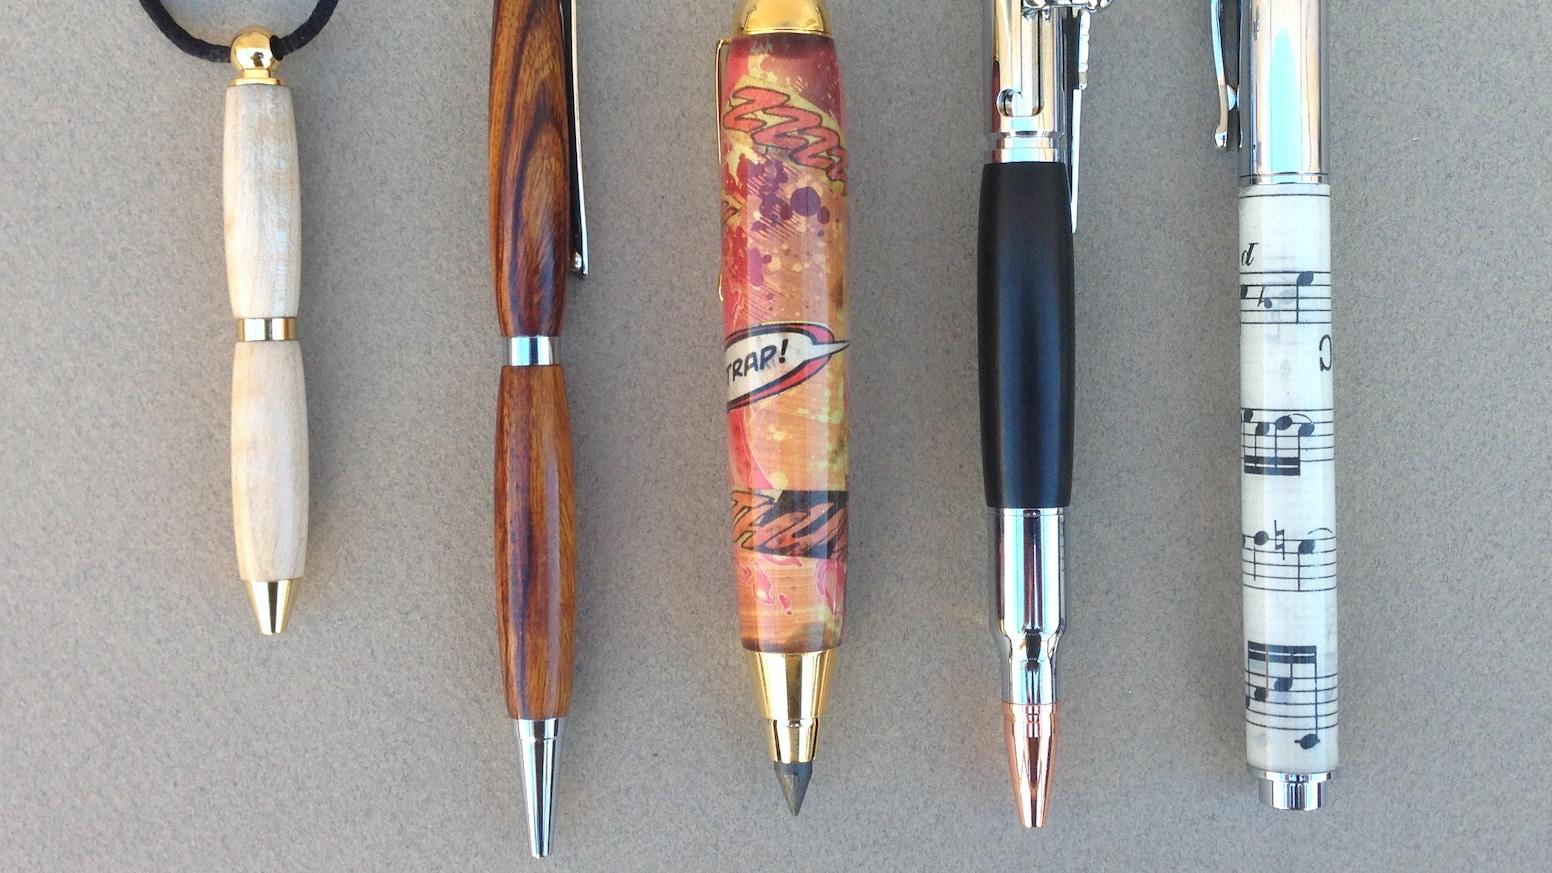 Comic Books + Wood + Sheet Music = Awesome Pens!